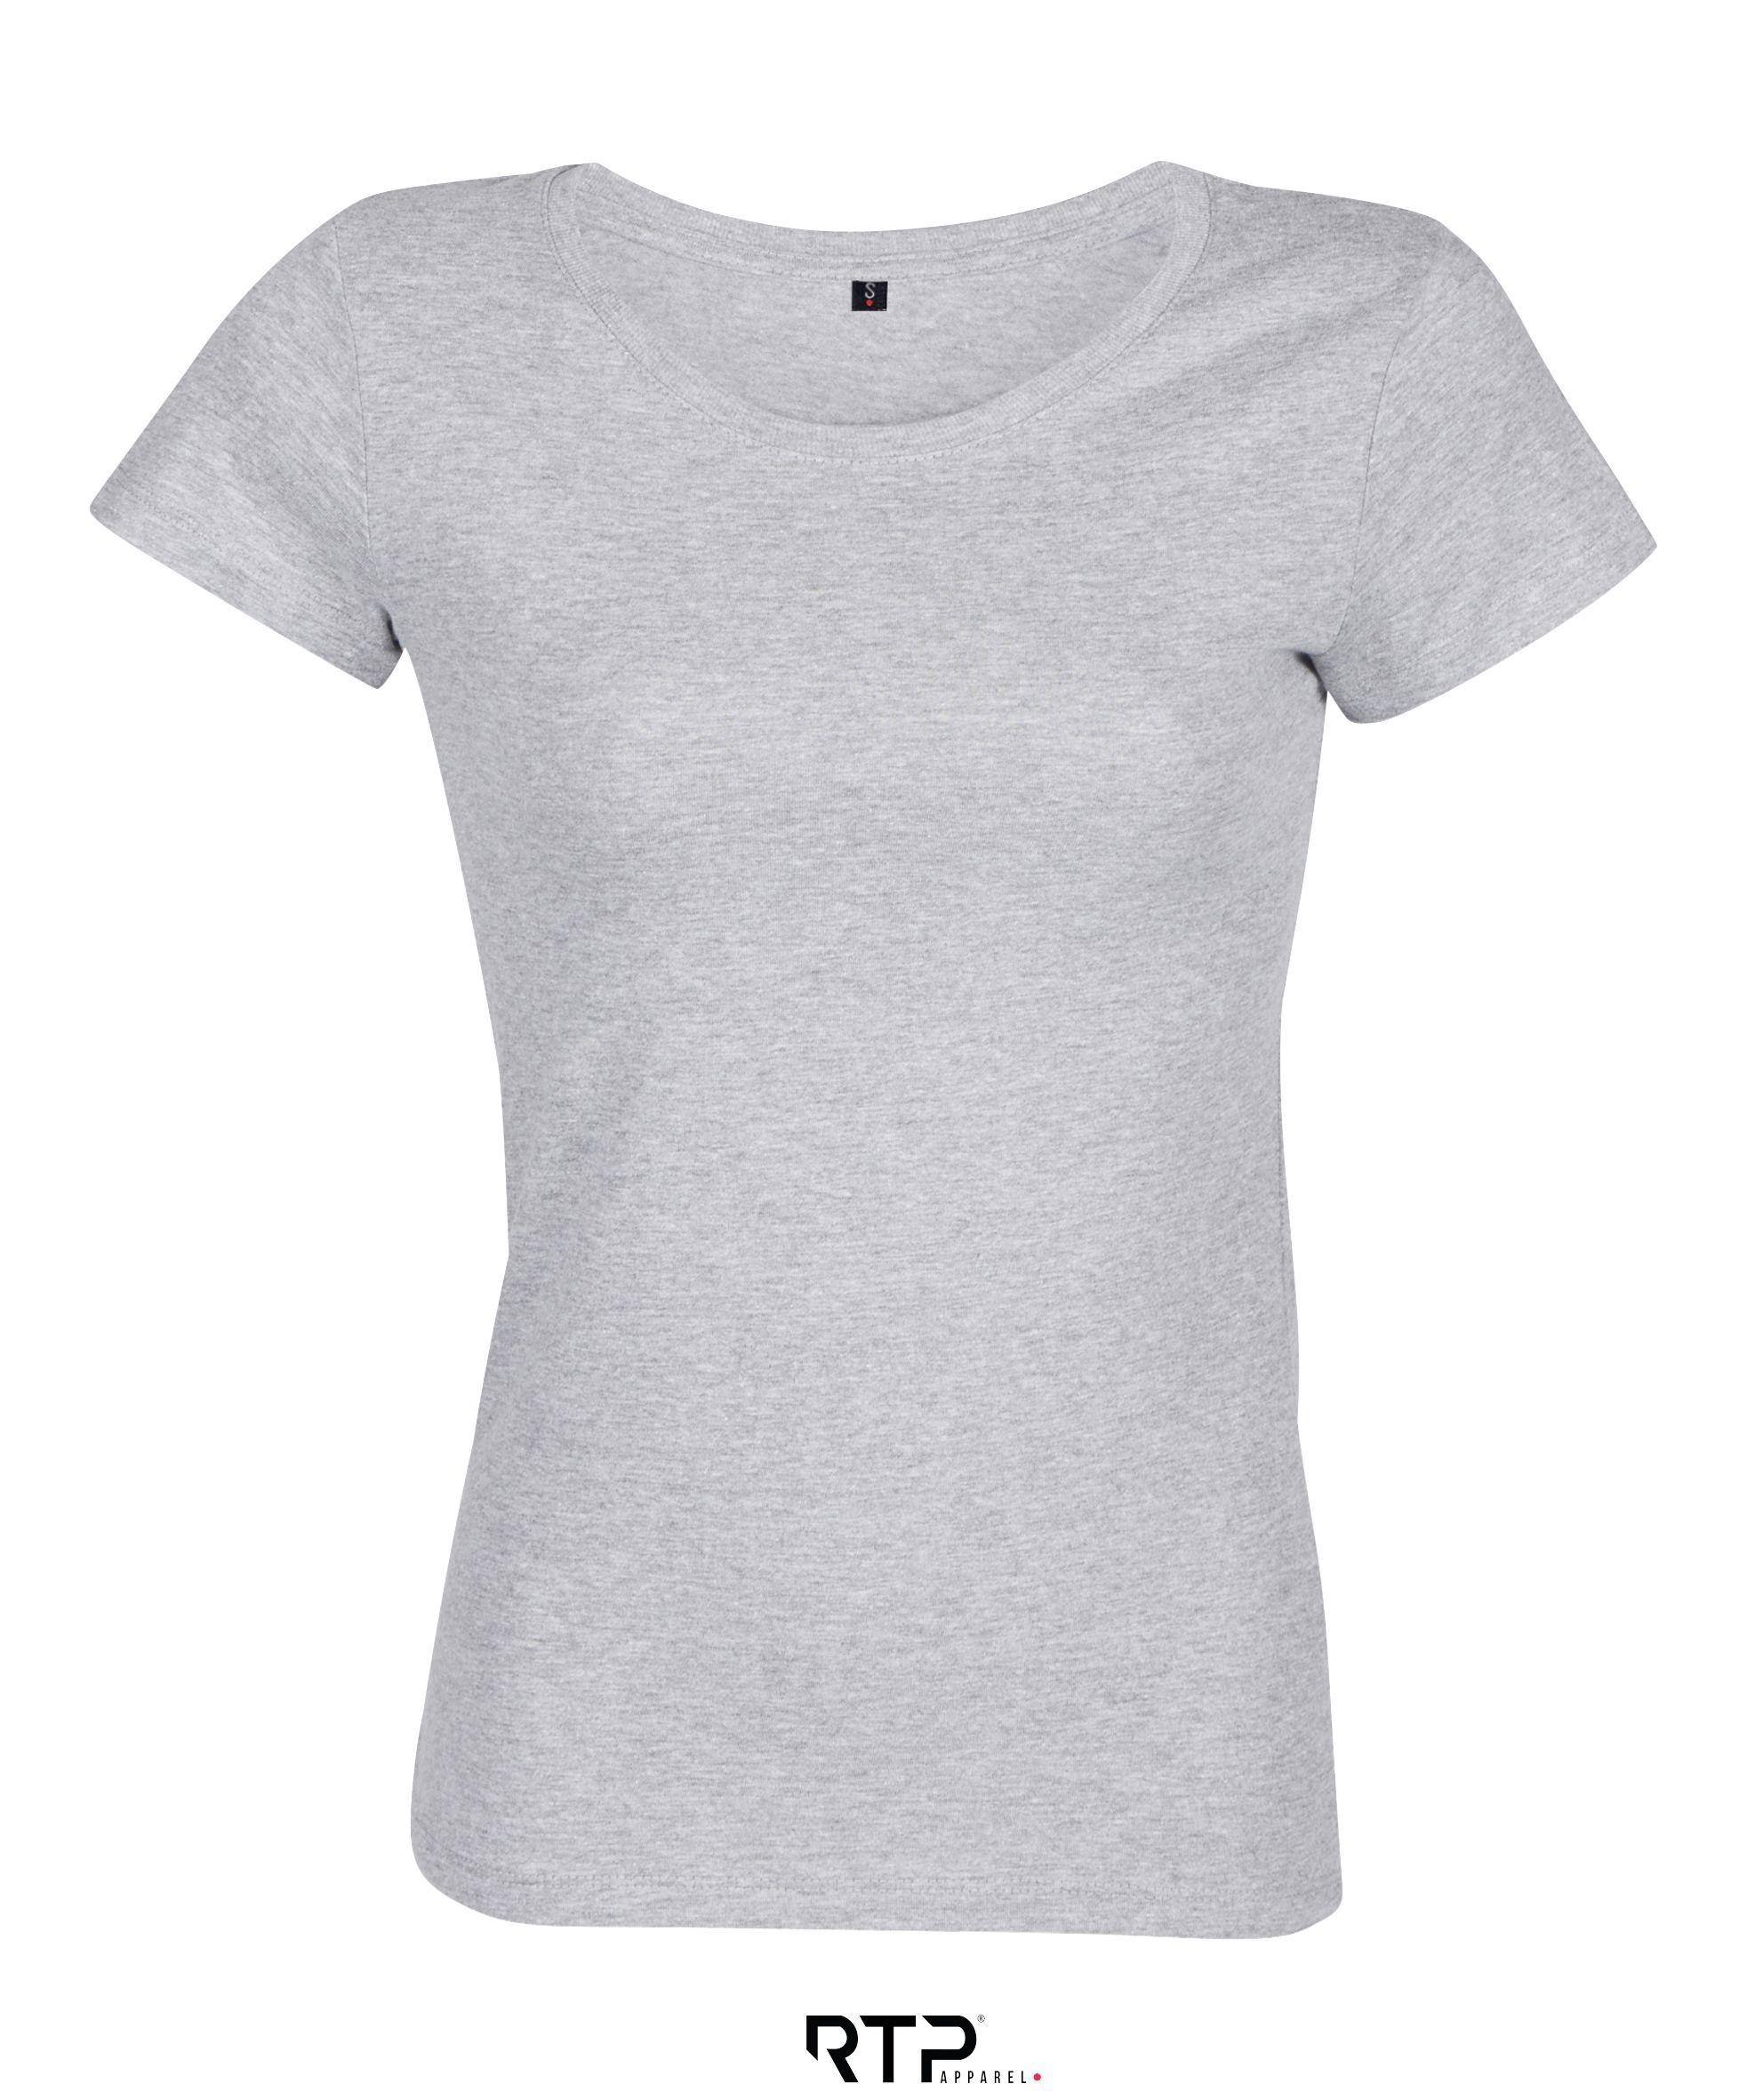 Tee-shirt femme coupe cousu manches courtes Tempo 145